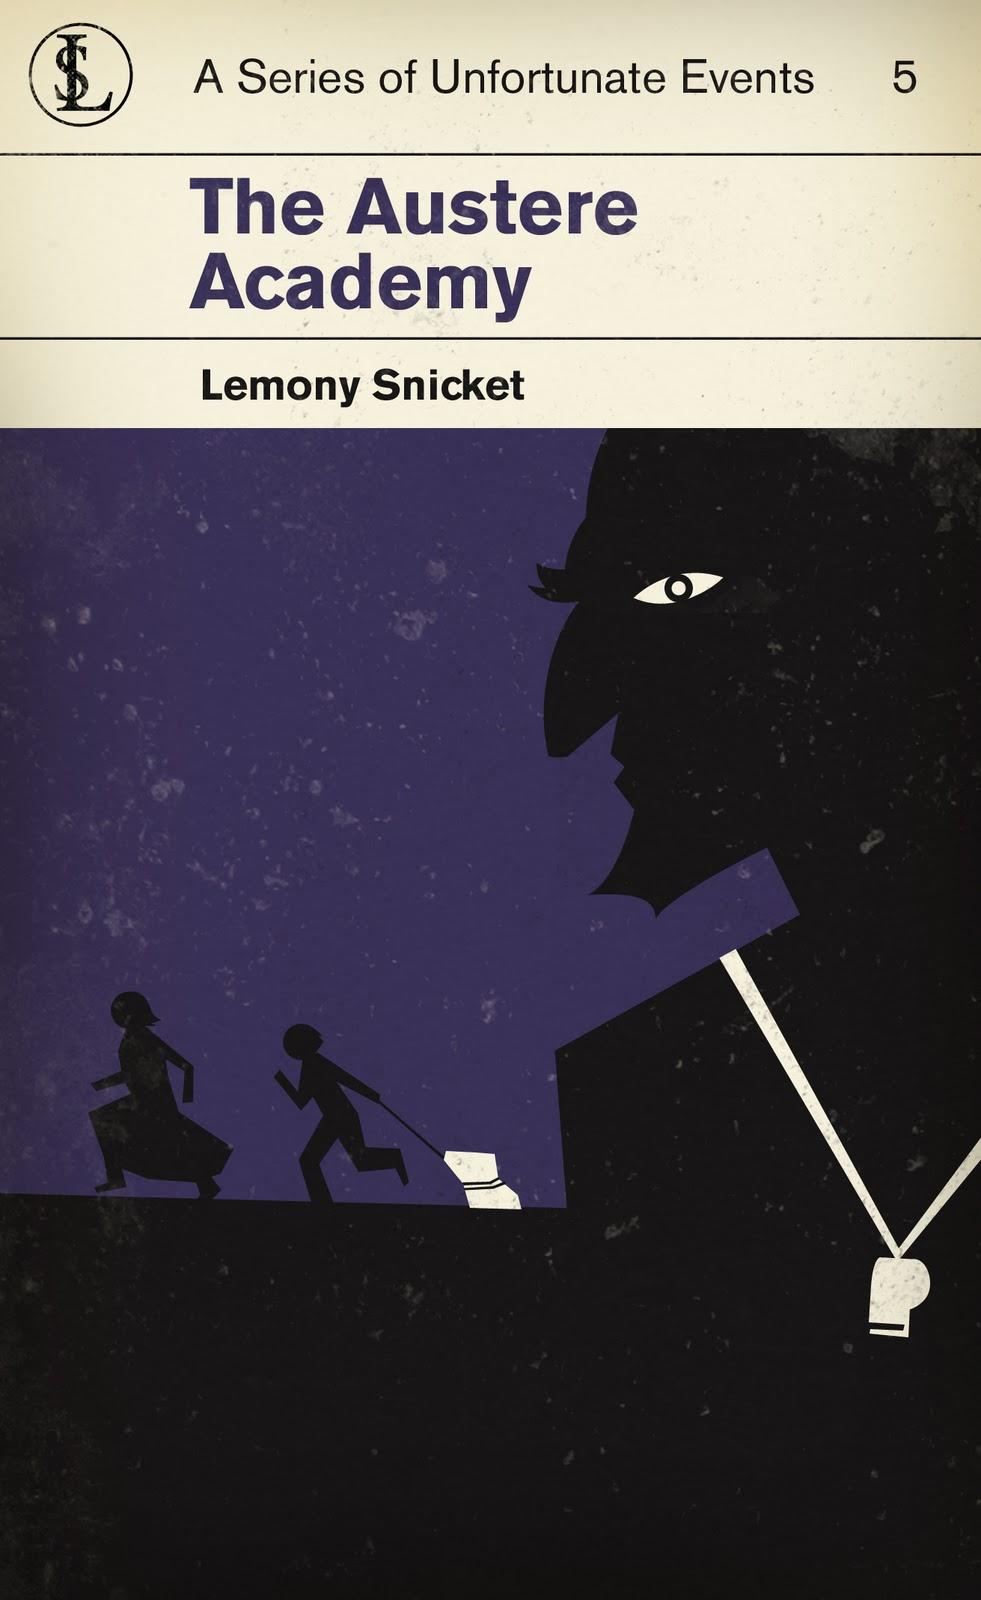 Lemony Snicket Redesign